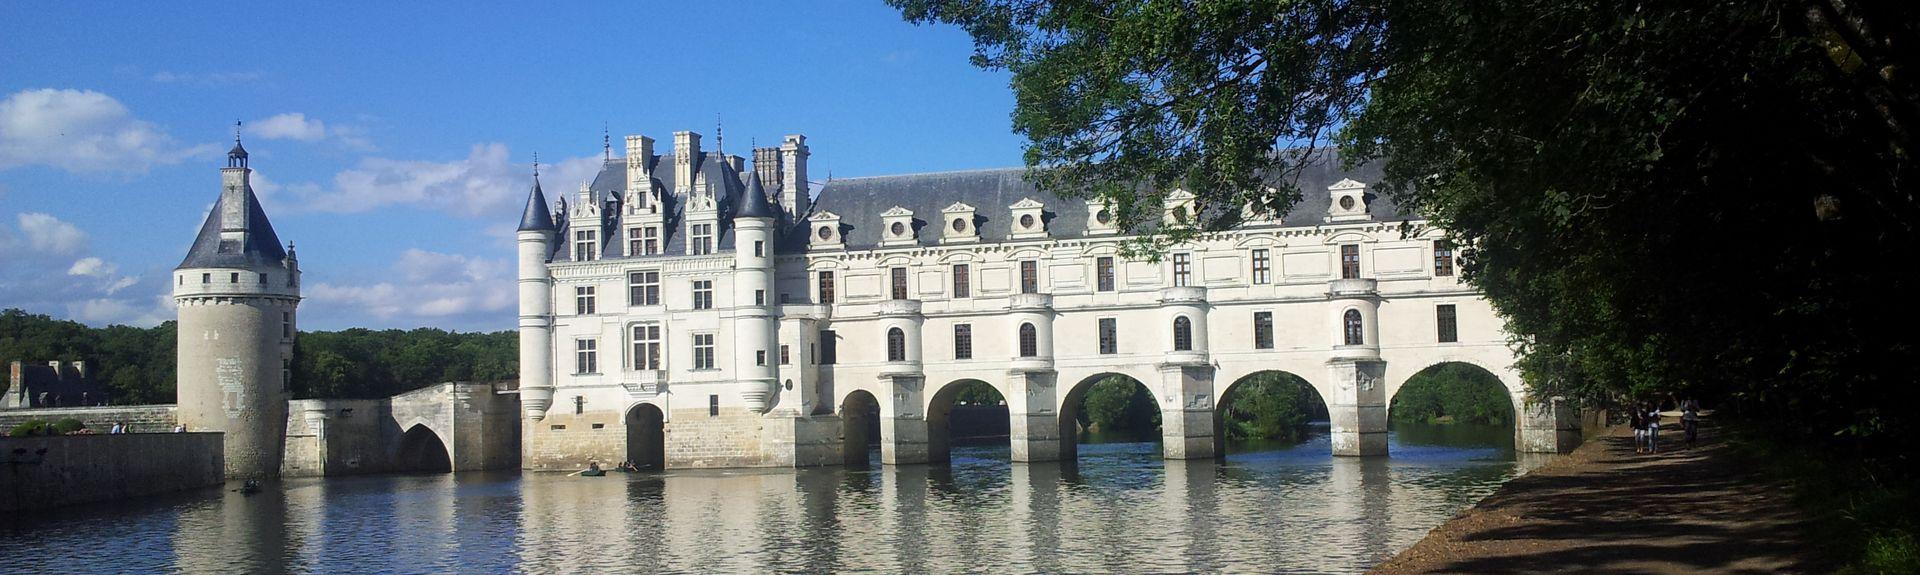 Notre-Dame-d'Oen asema, Notre-Dame-d'Oe, Keski-, Ranska